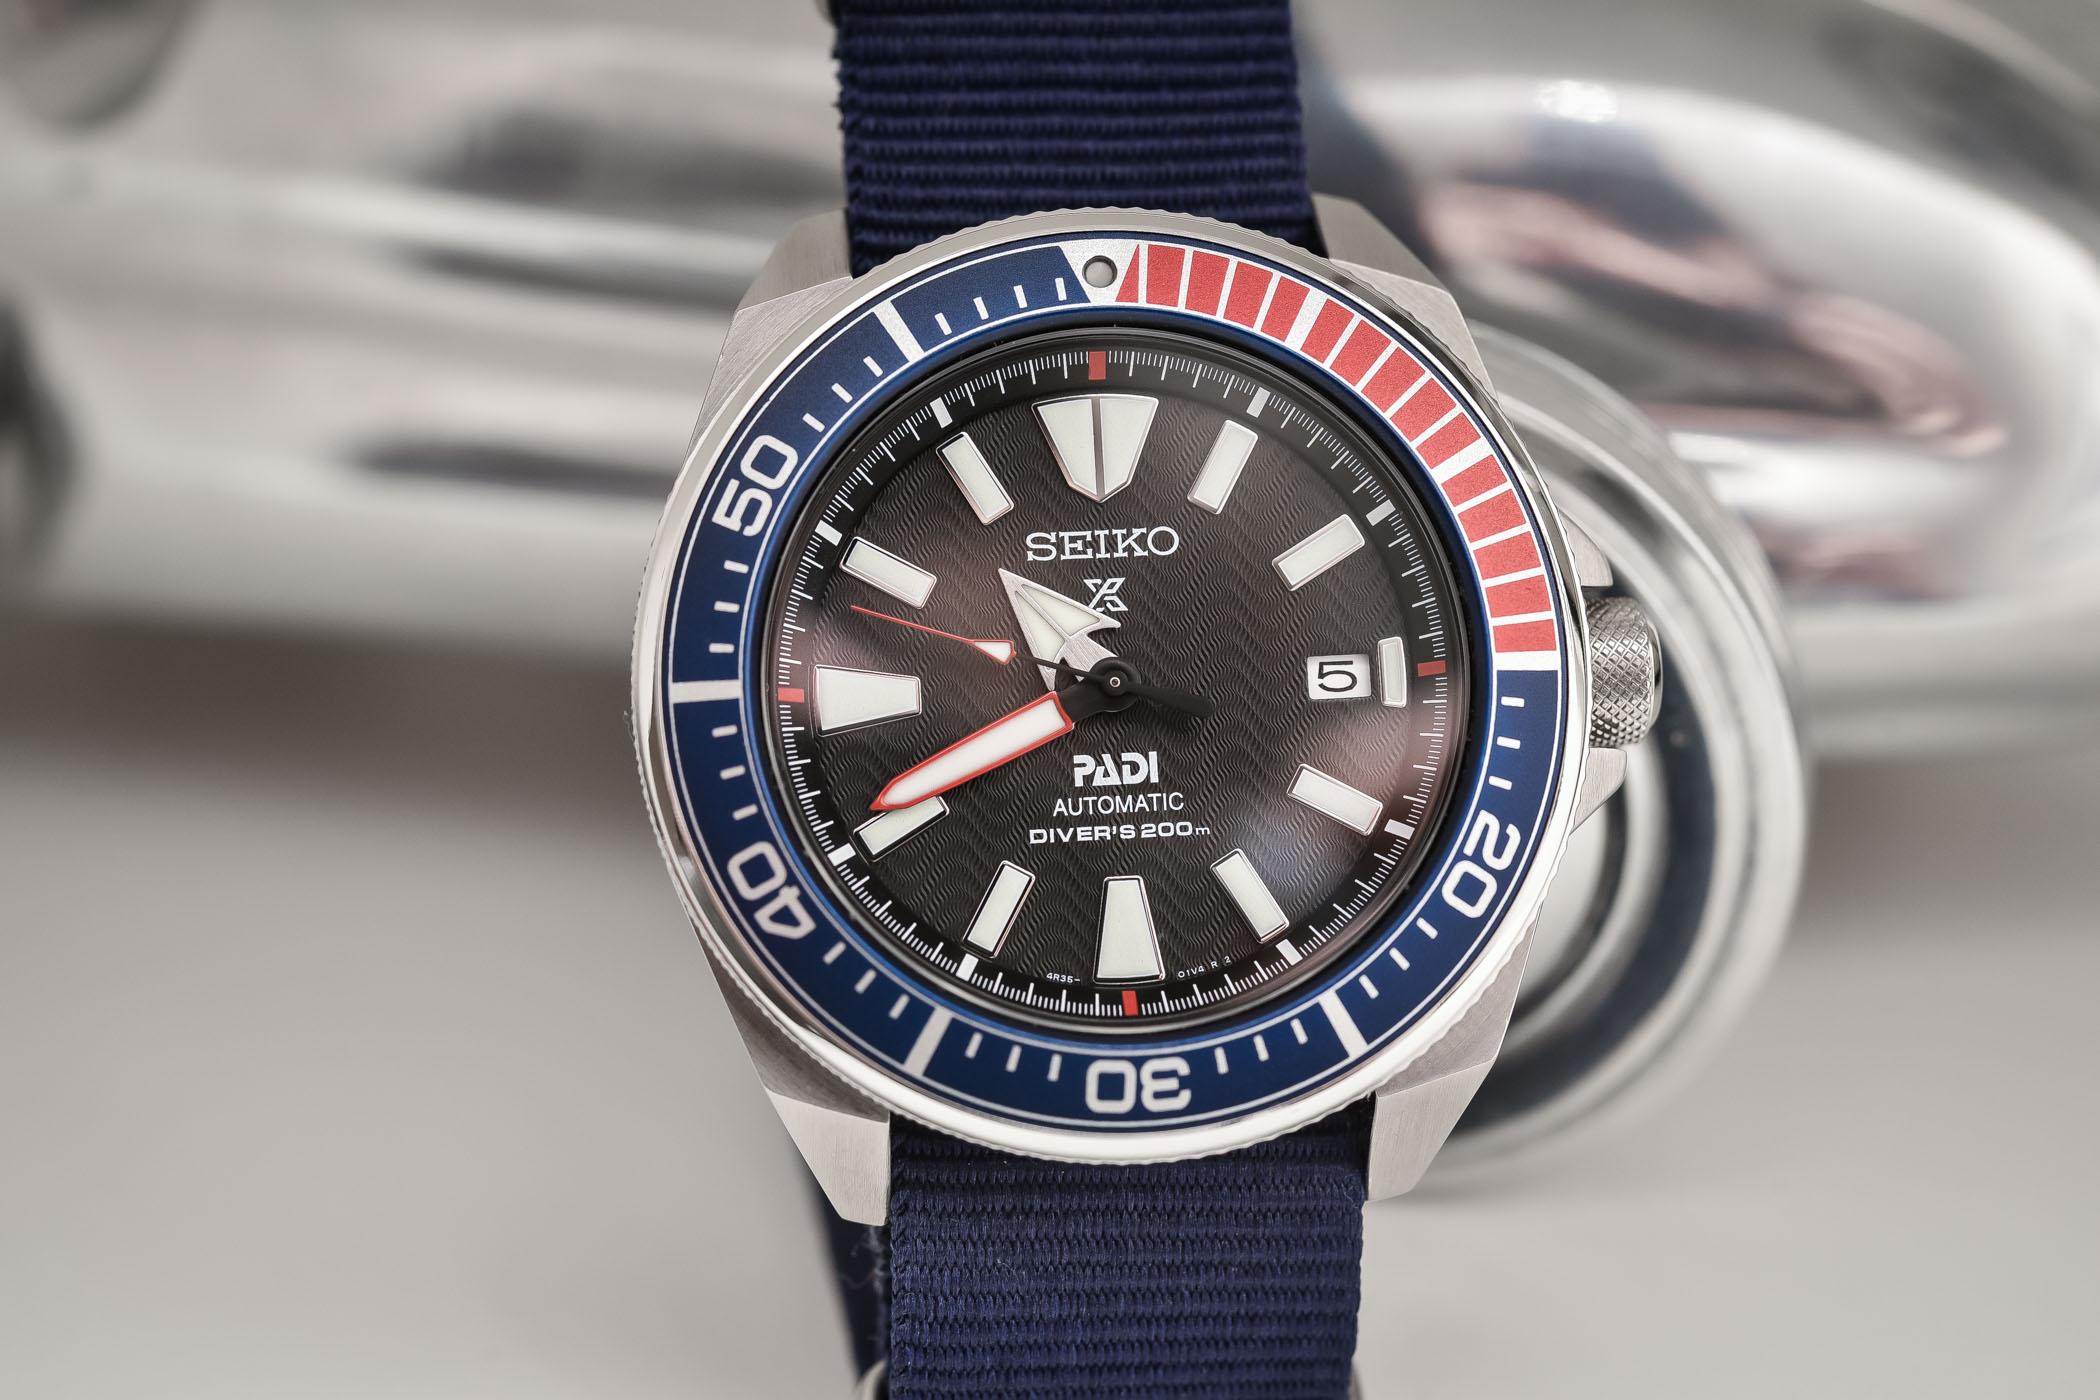 Seiko Prospex Automatic Diver Padi Samurai SRPB99J1 - 8 - Monochrome ... 1932058881